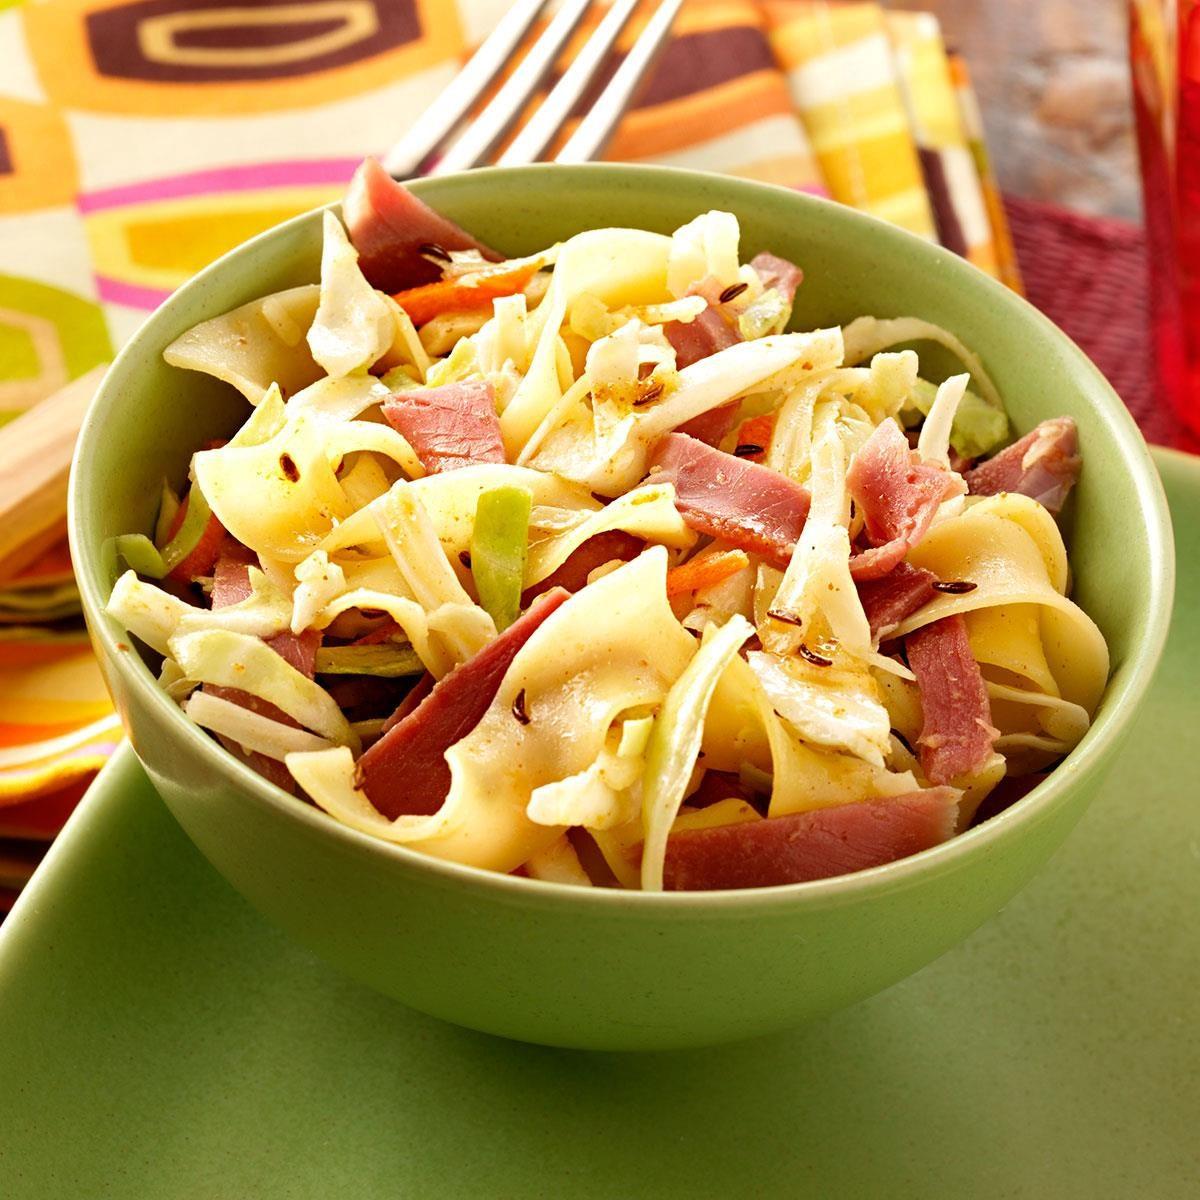 Reuben Pasta Salad